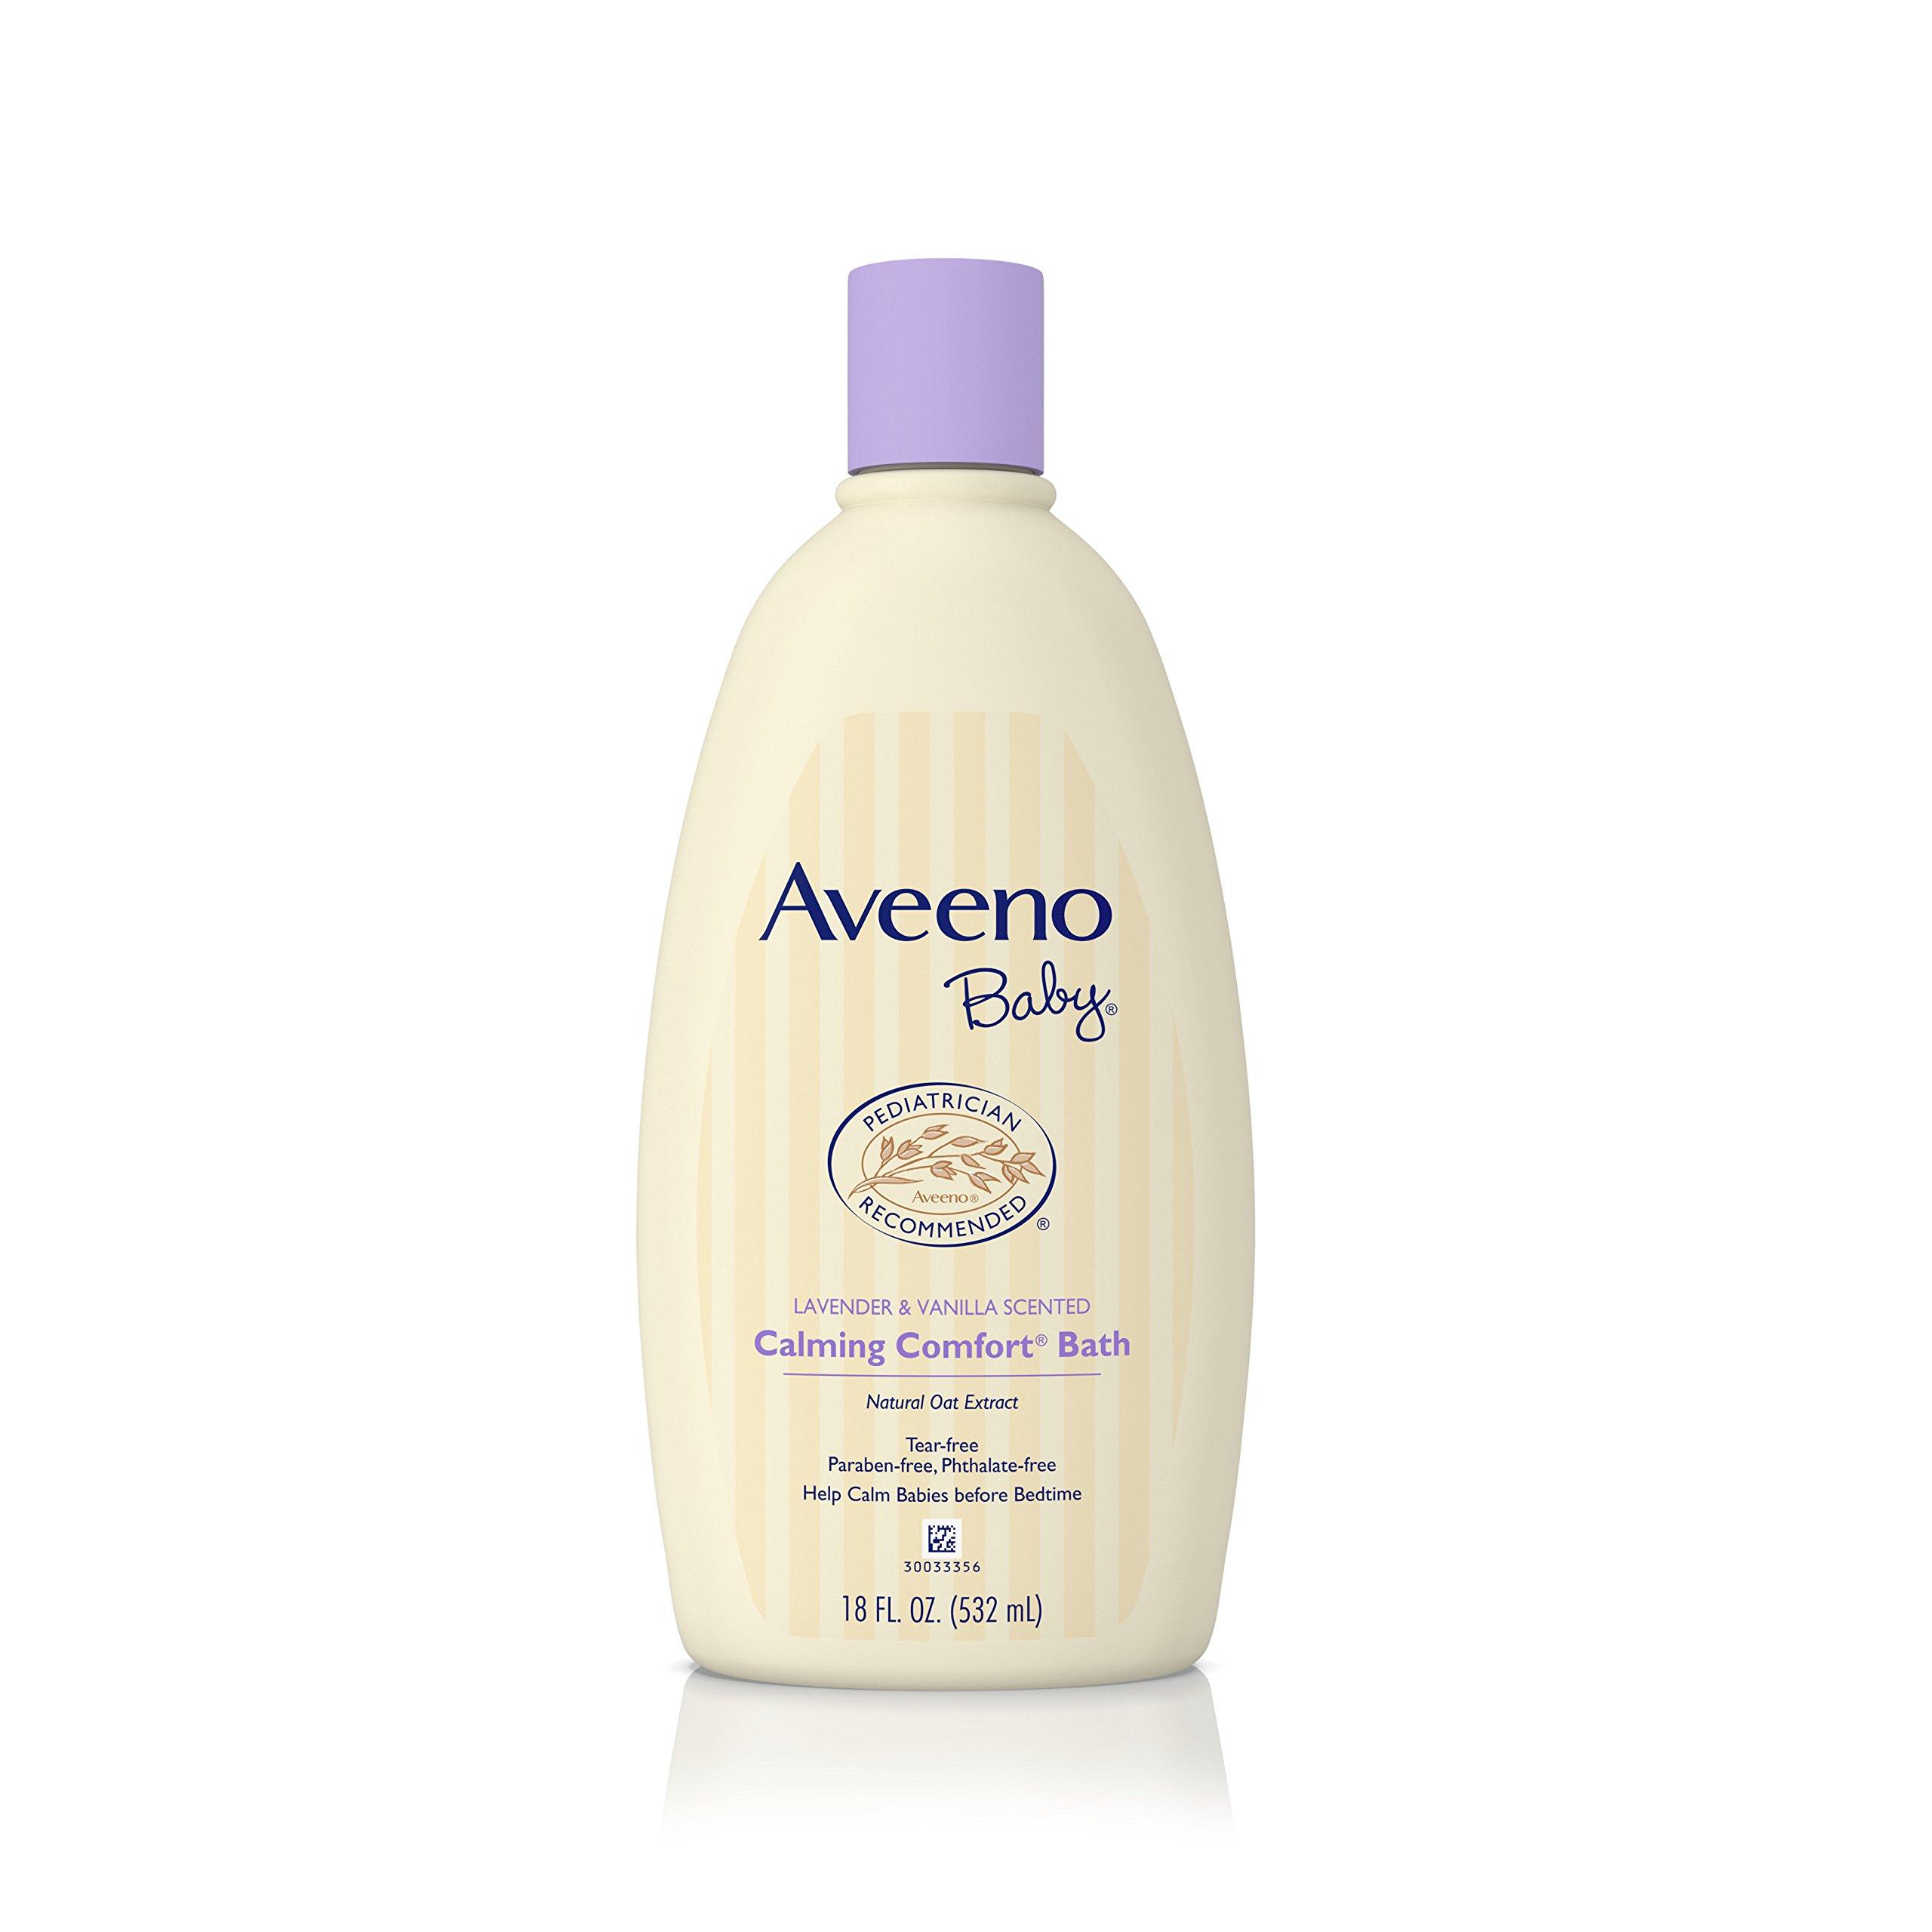 Aveeno Baby Calming Comfort Bath Wash, Tear Free, Lavender & Vanilla, 18 Fl. Oz.